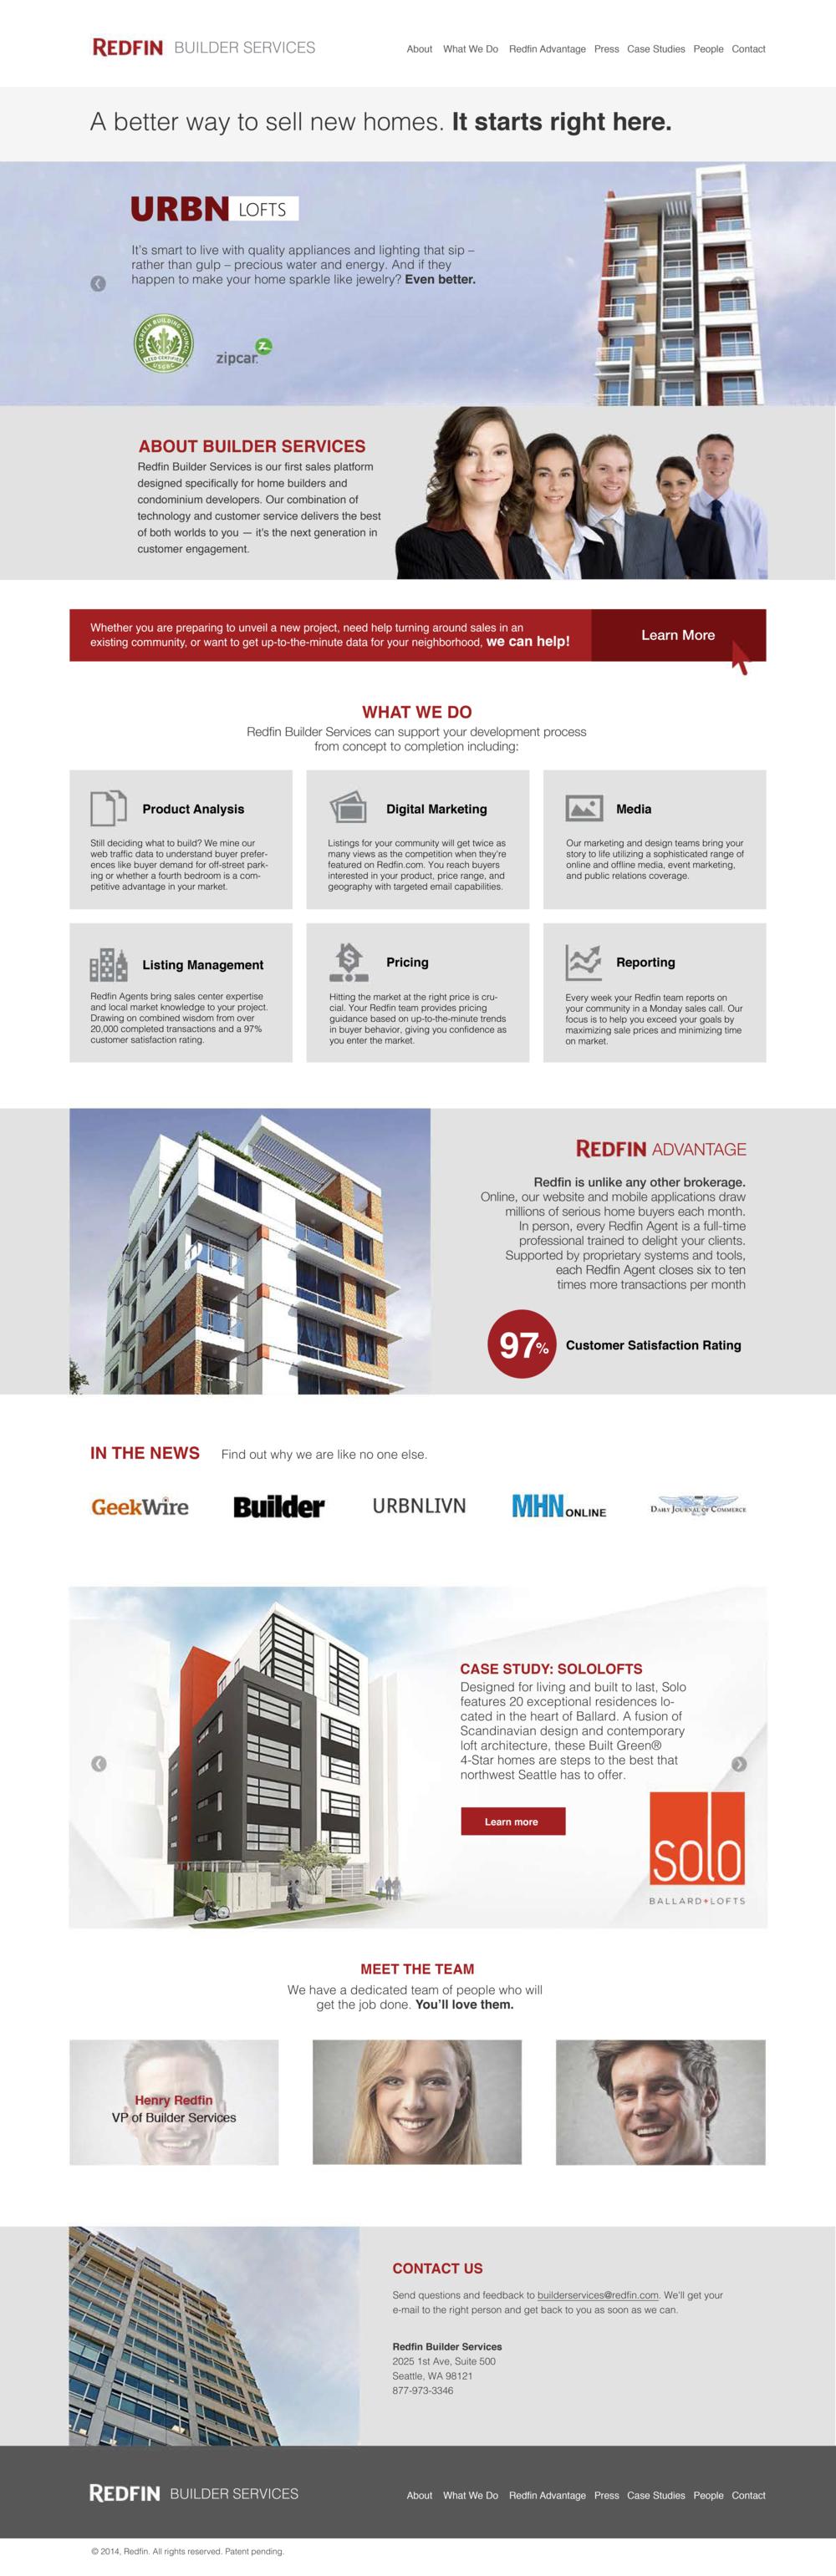 RF_BuilderServicesWebpage.png